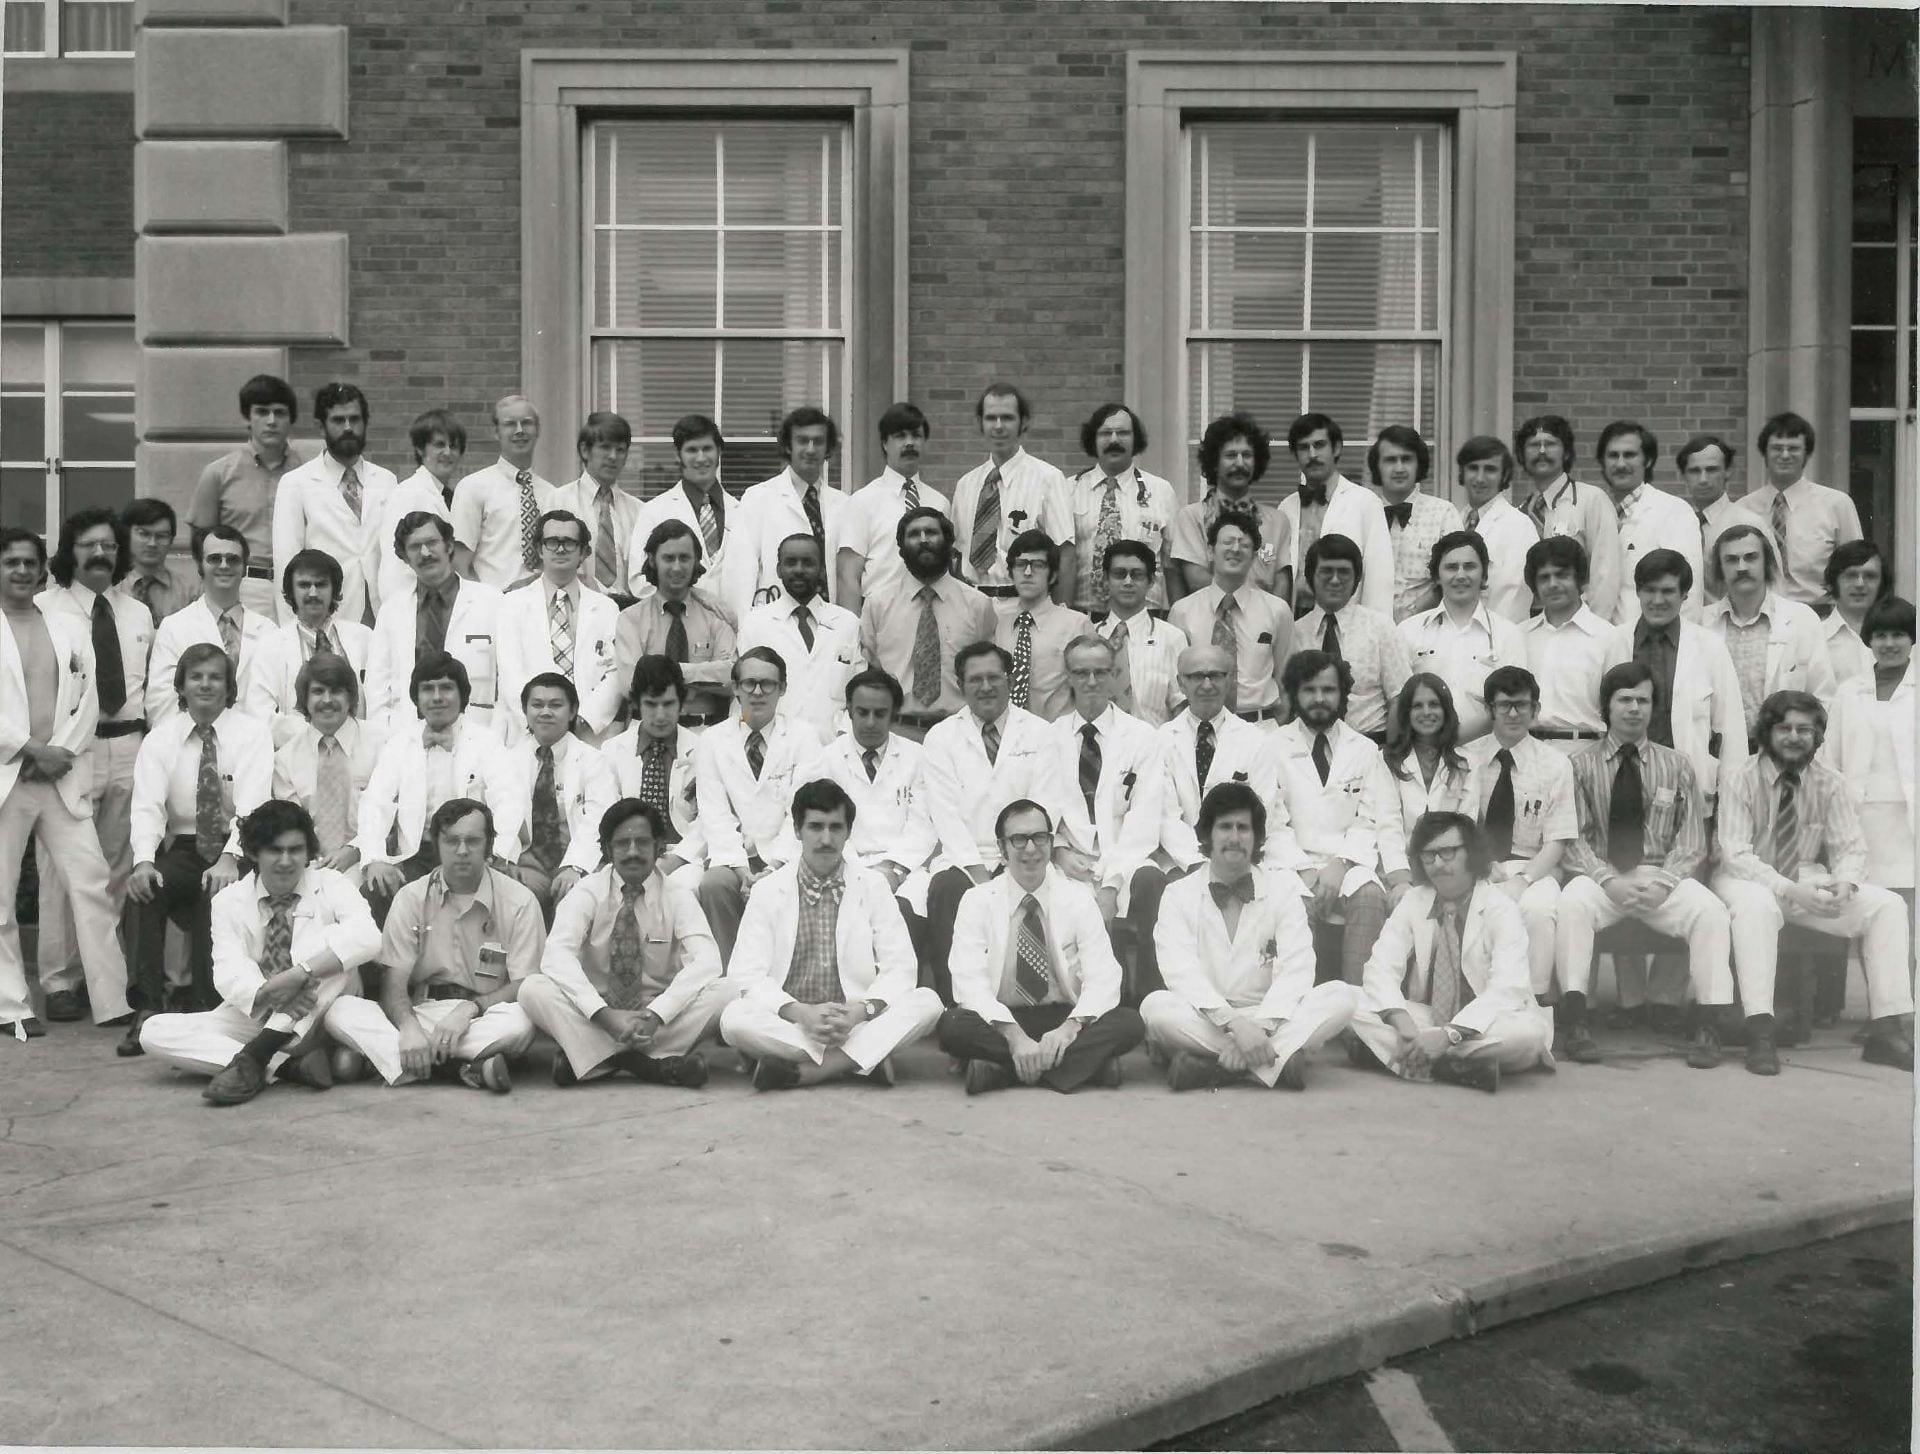 1973 Housestaff Photo